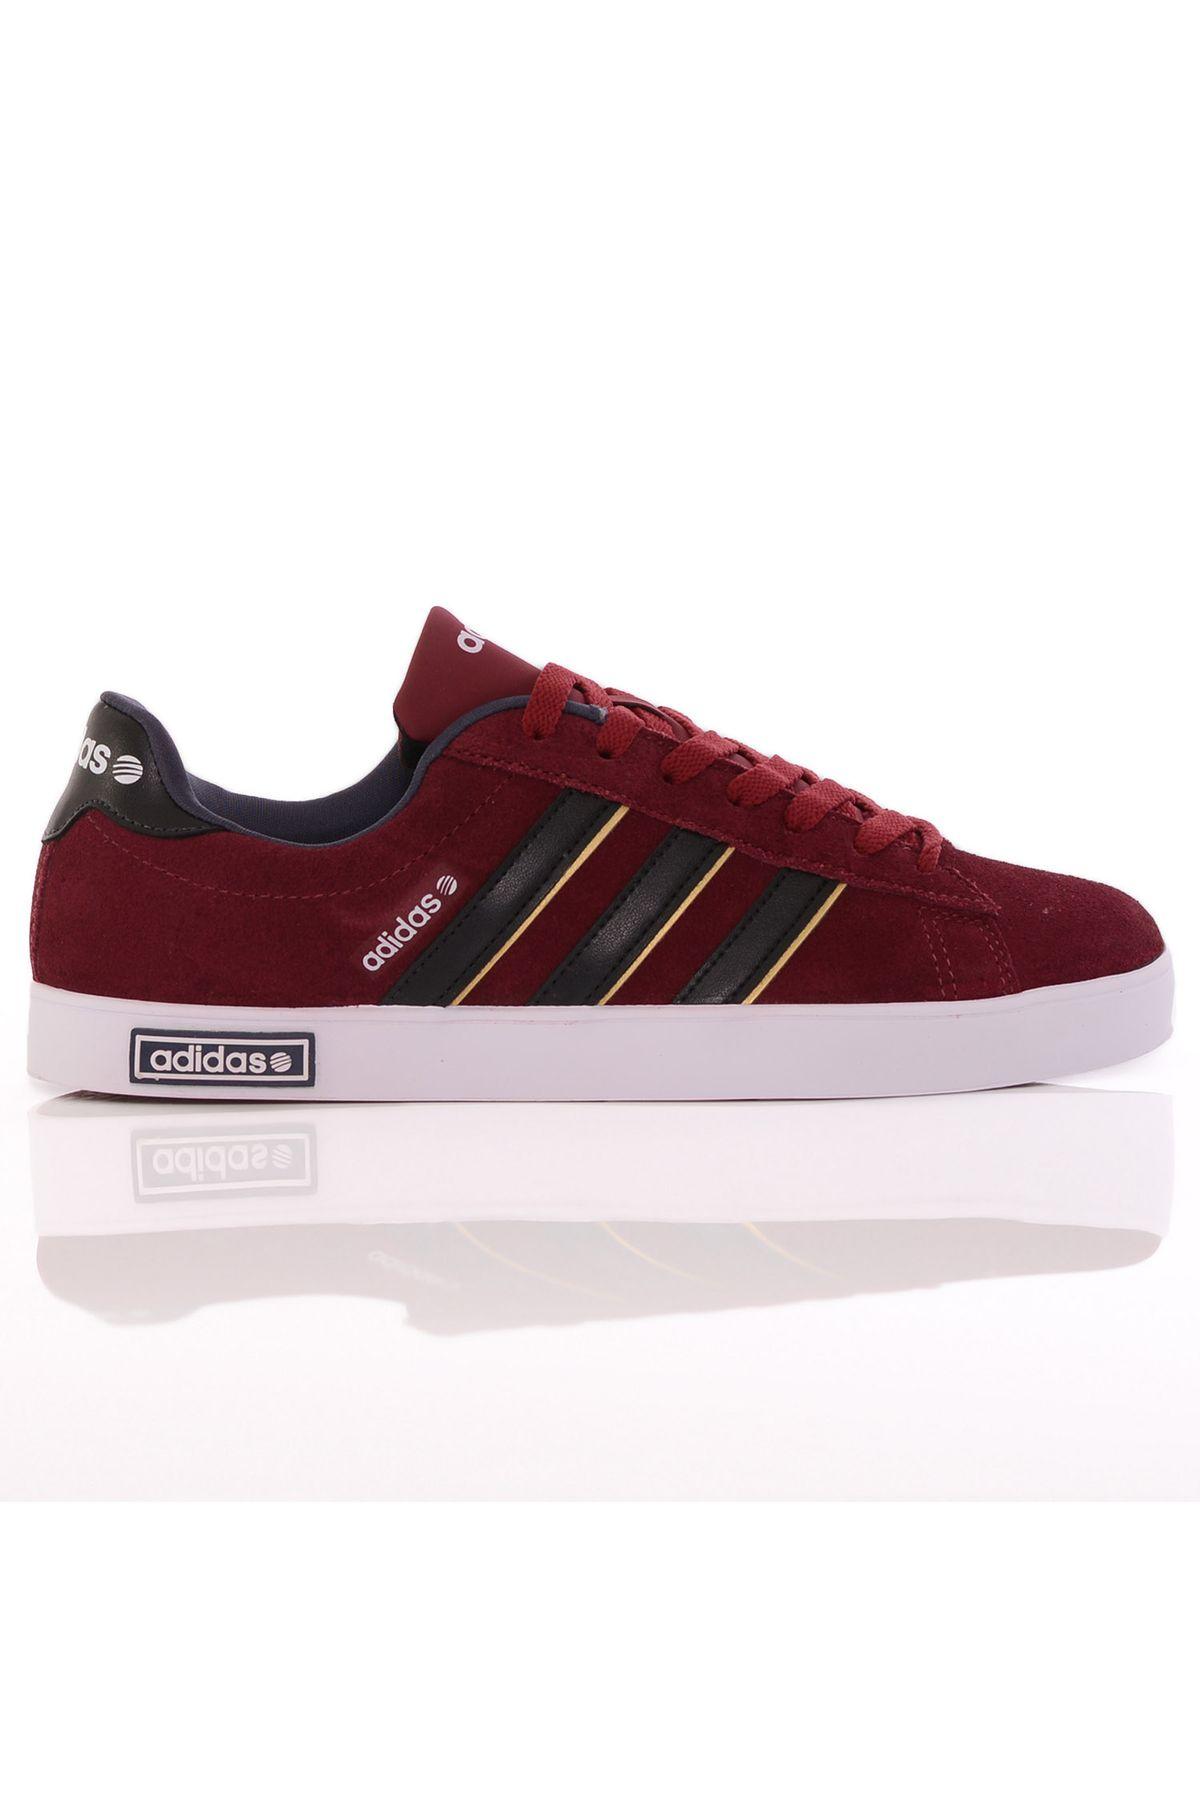 5c6b9a1ecd2 Tênis Adidas Coderby Vulc